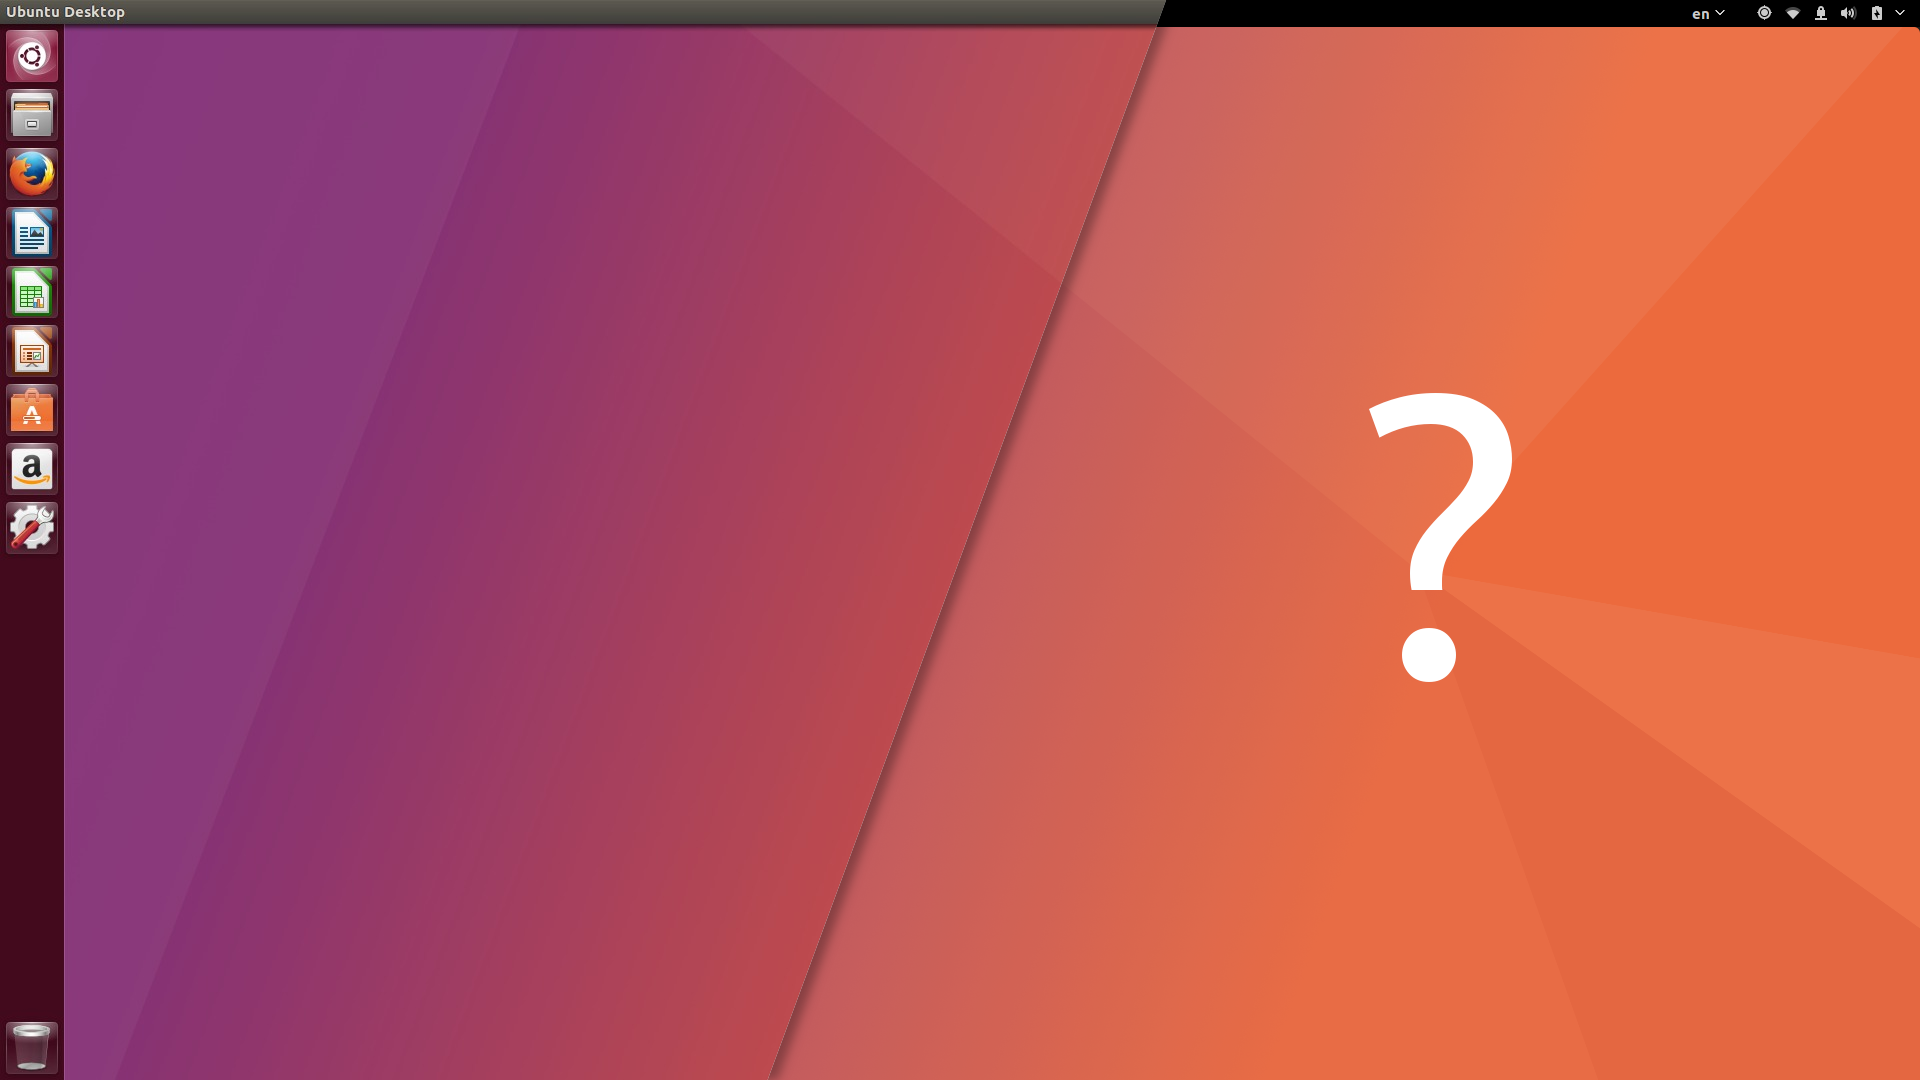 Cambiar de Unity a Gnome-Shell: primeros desafíos